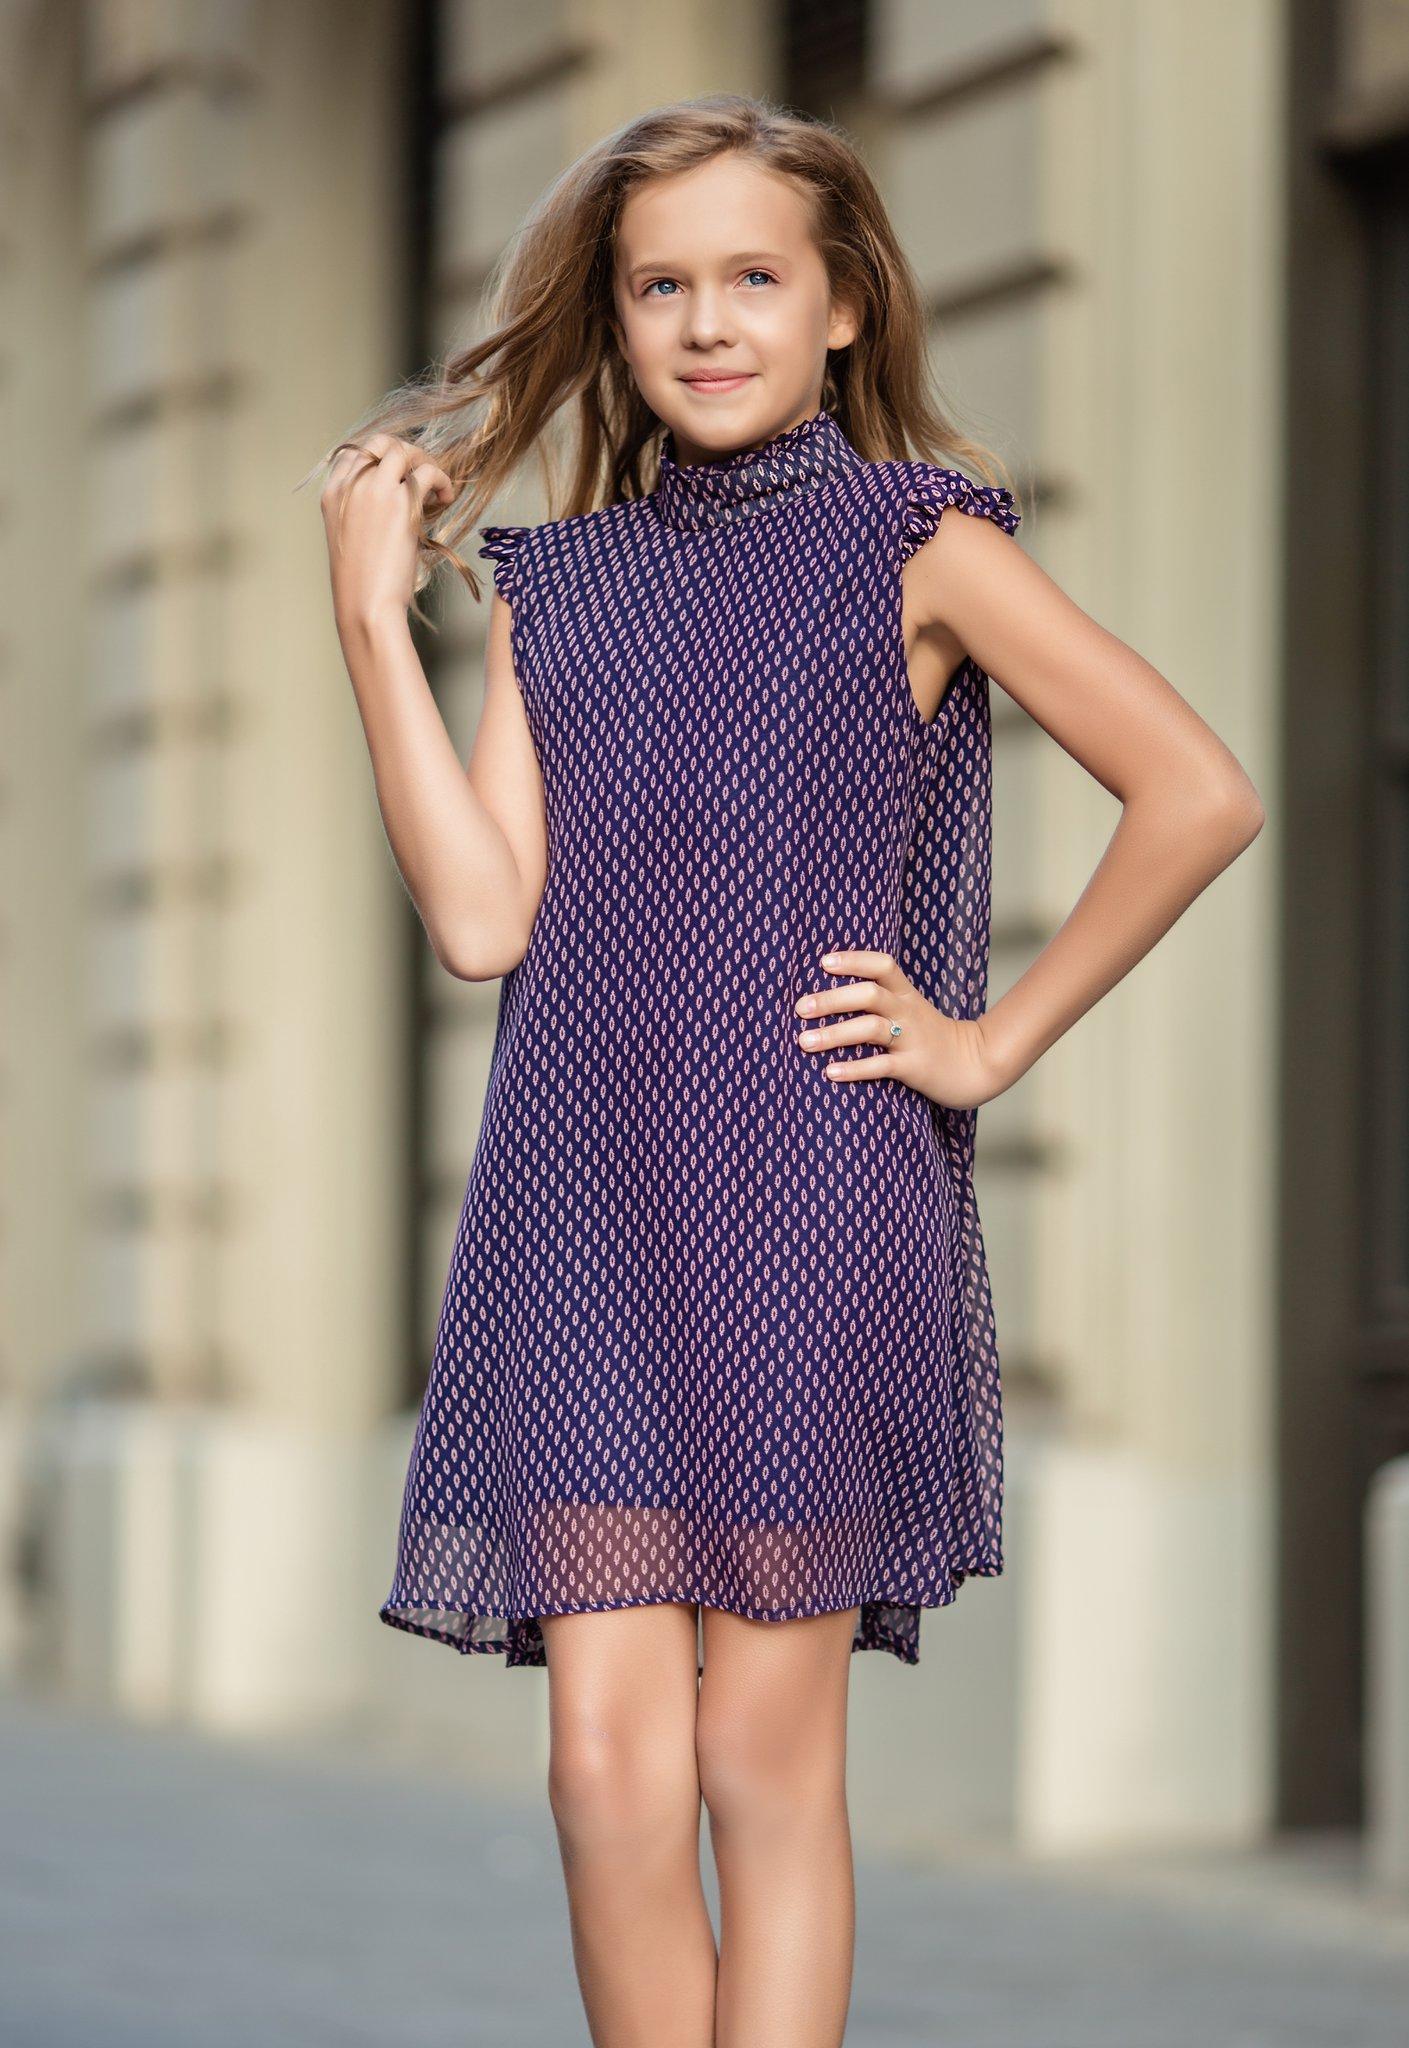 Sukienka szyfonowa - Domino.little.dress